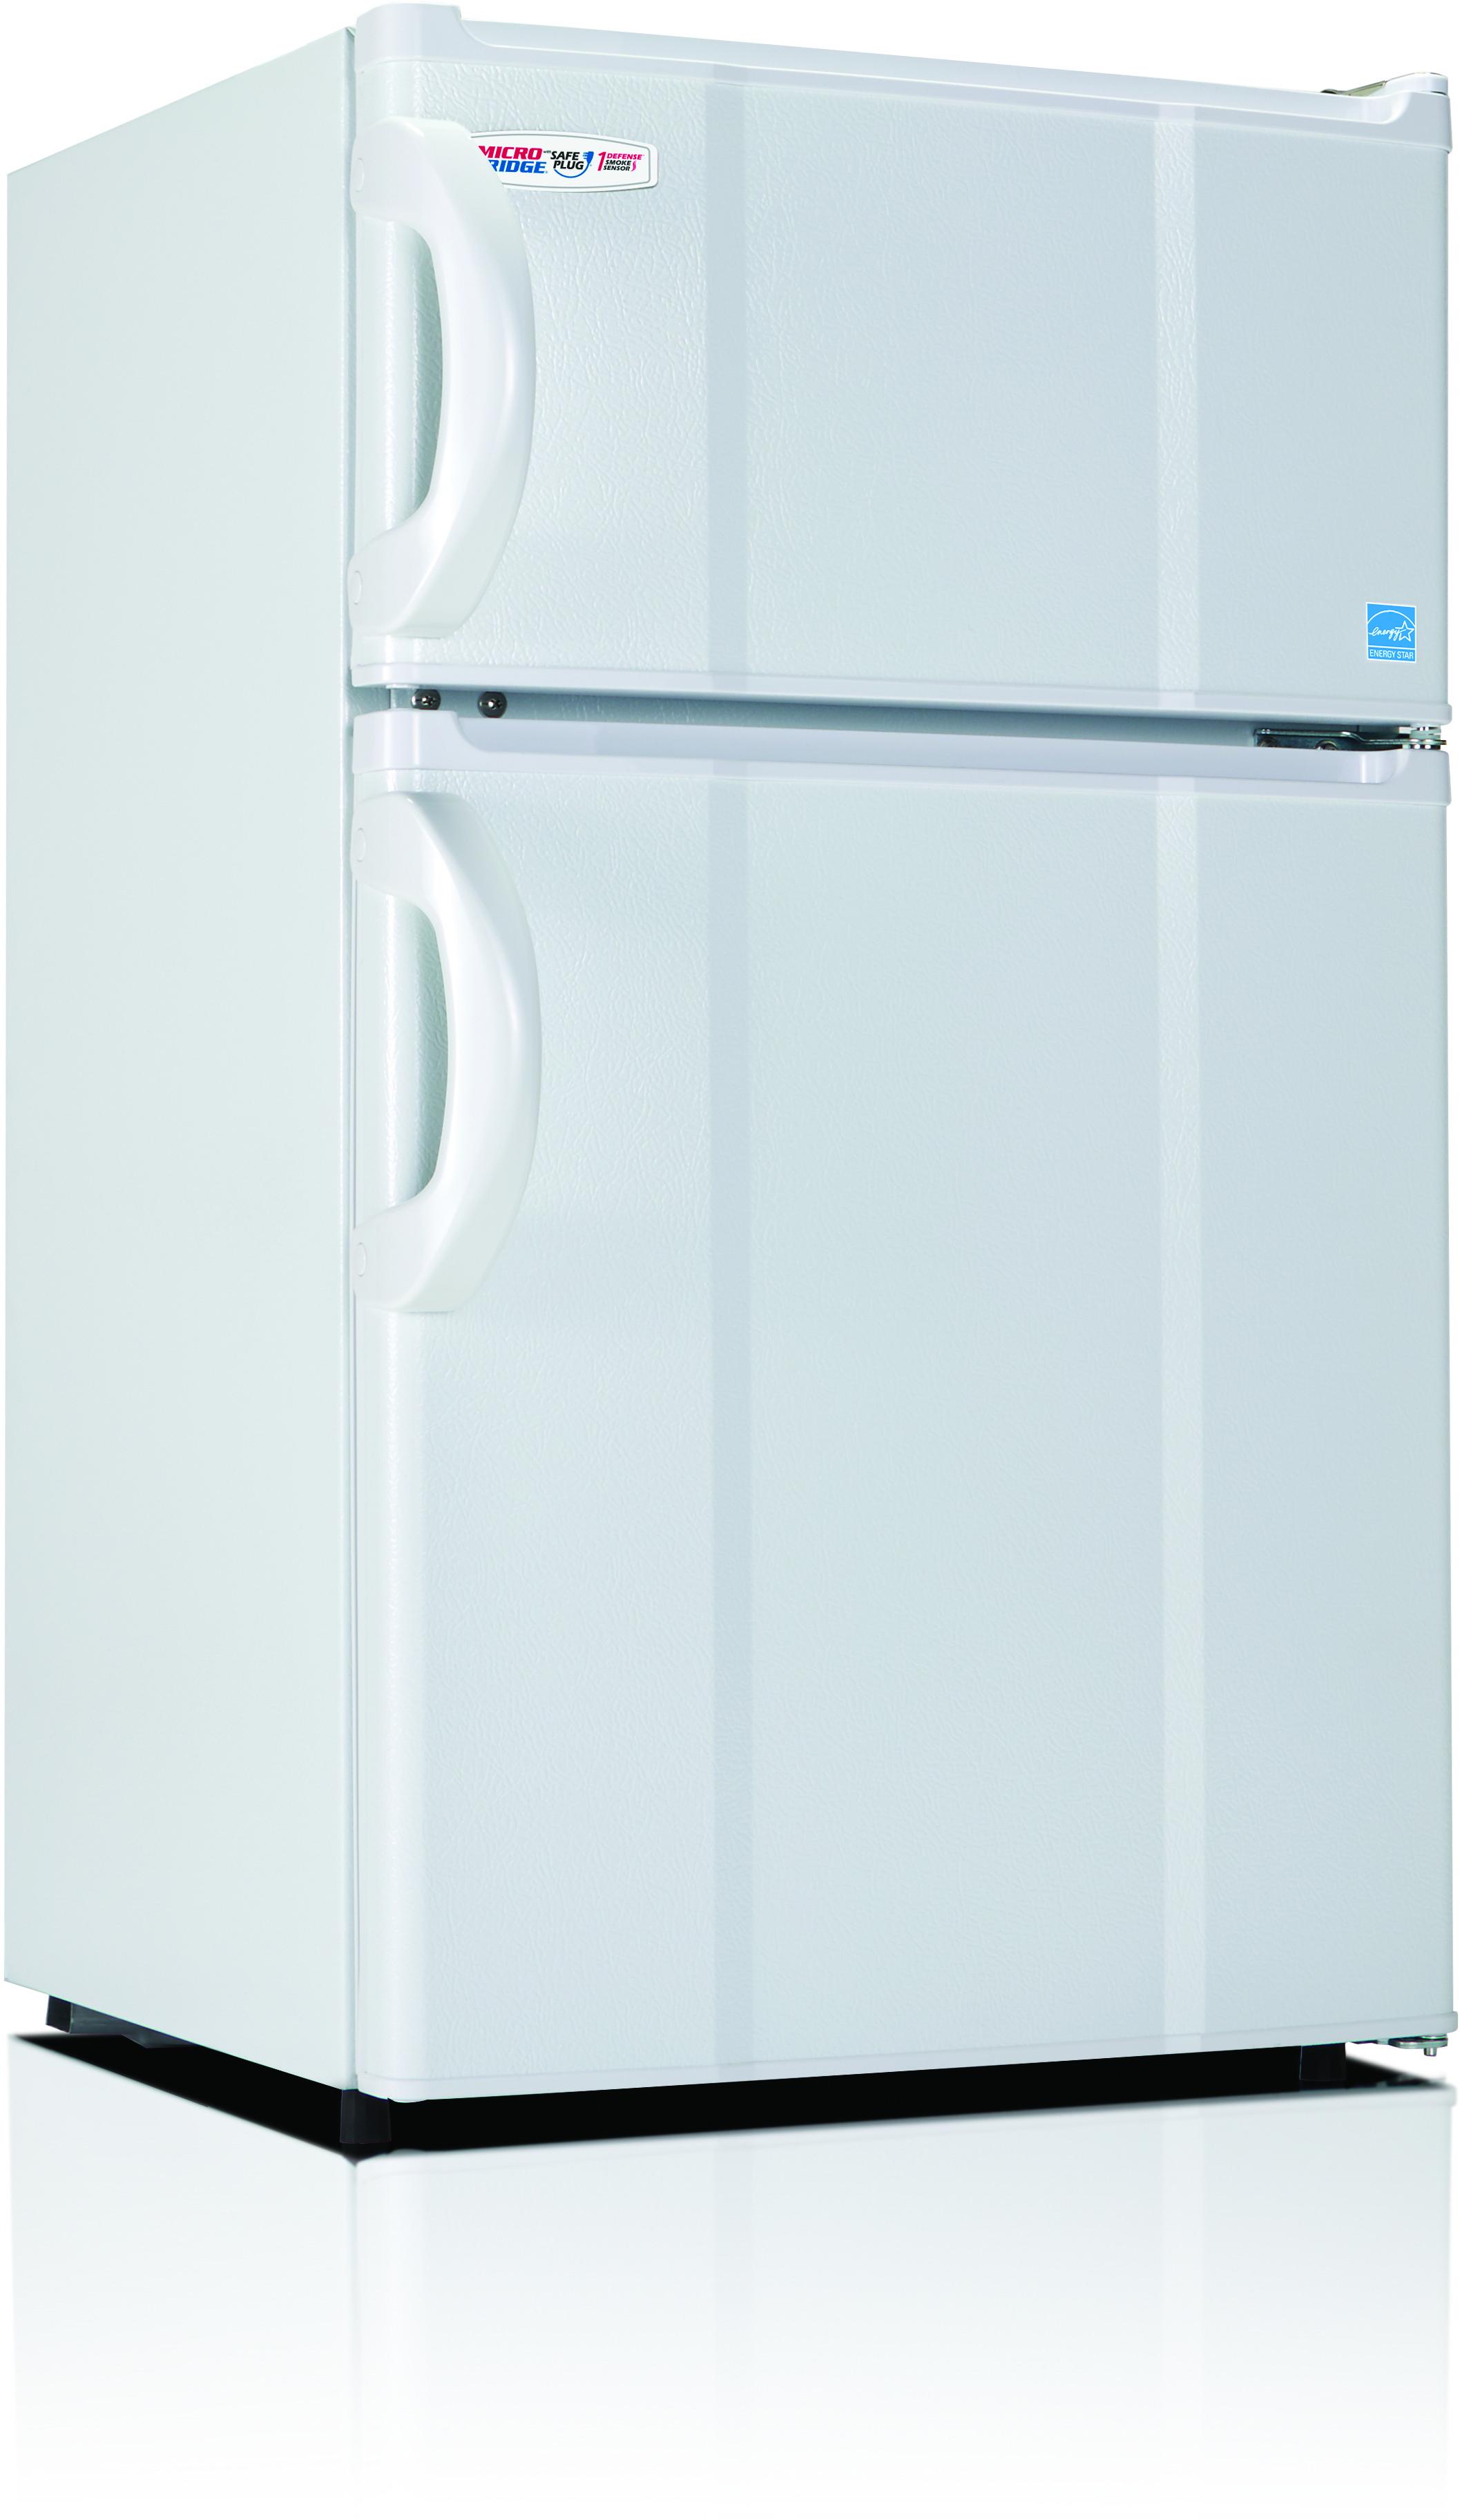 MicroFridge 30RMFRW 3.0 cu. ft. Compact Refrigerator with 1 Wire Shelf, Crisper Drawer, 2 Door Bins, 0-¦ Freezer, Full-Width Door Bin and Ice Cube Tray